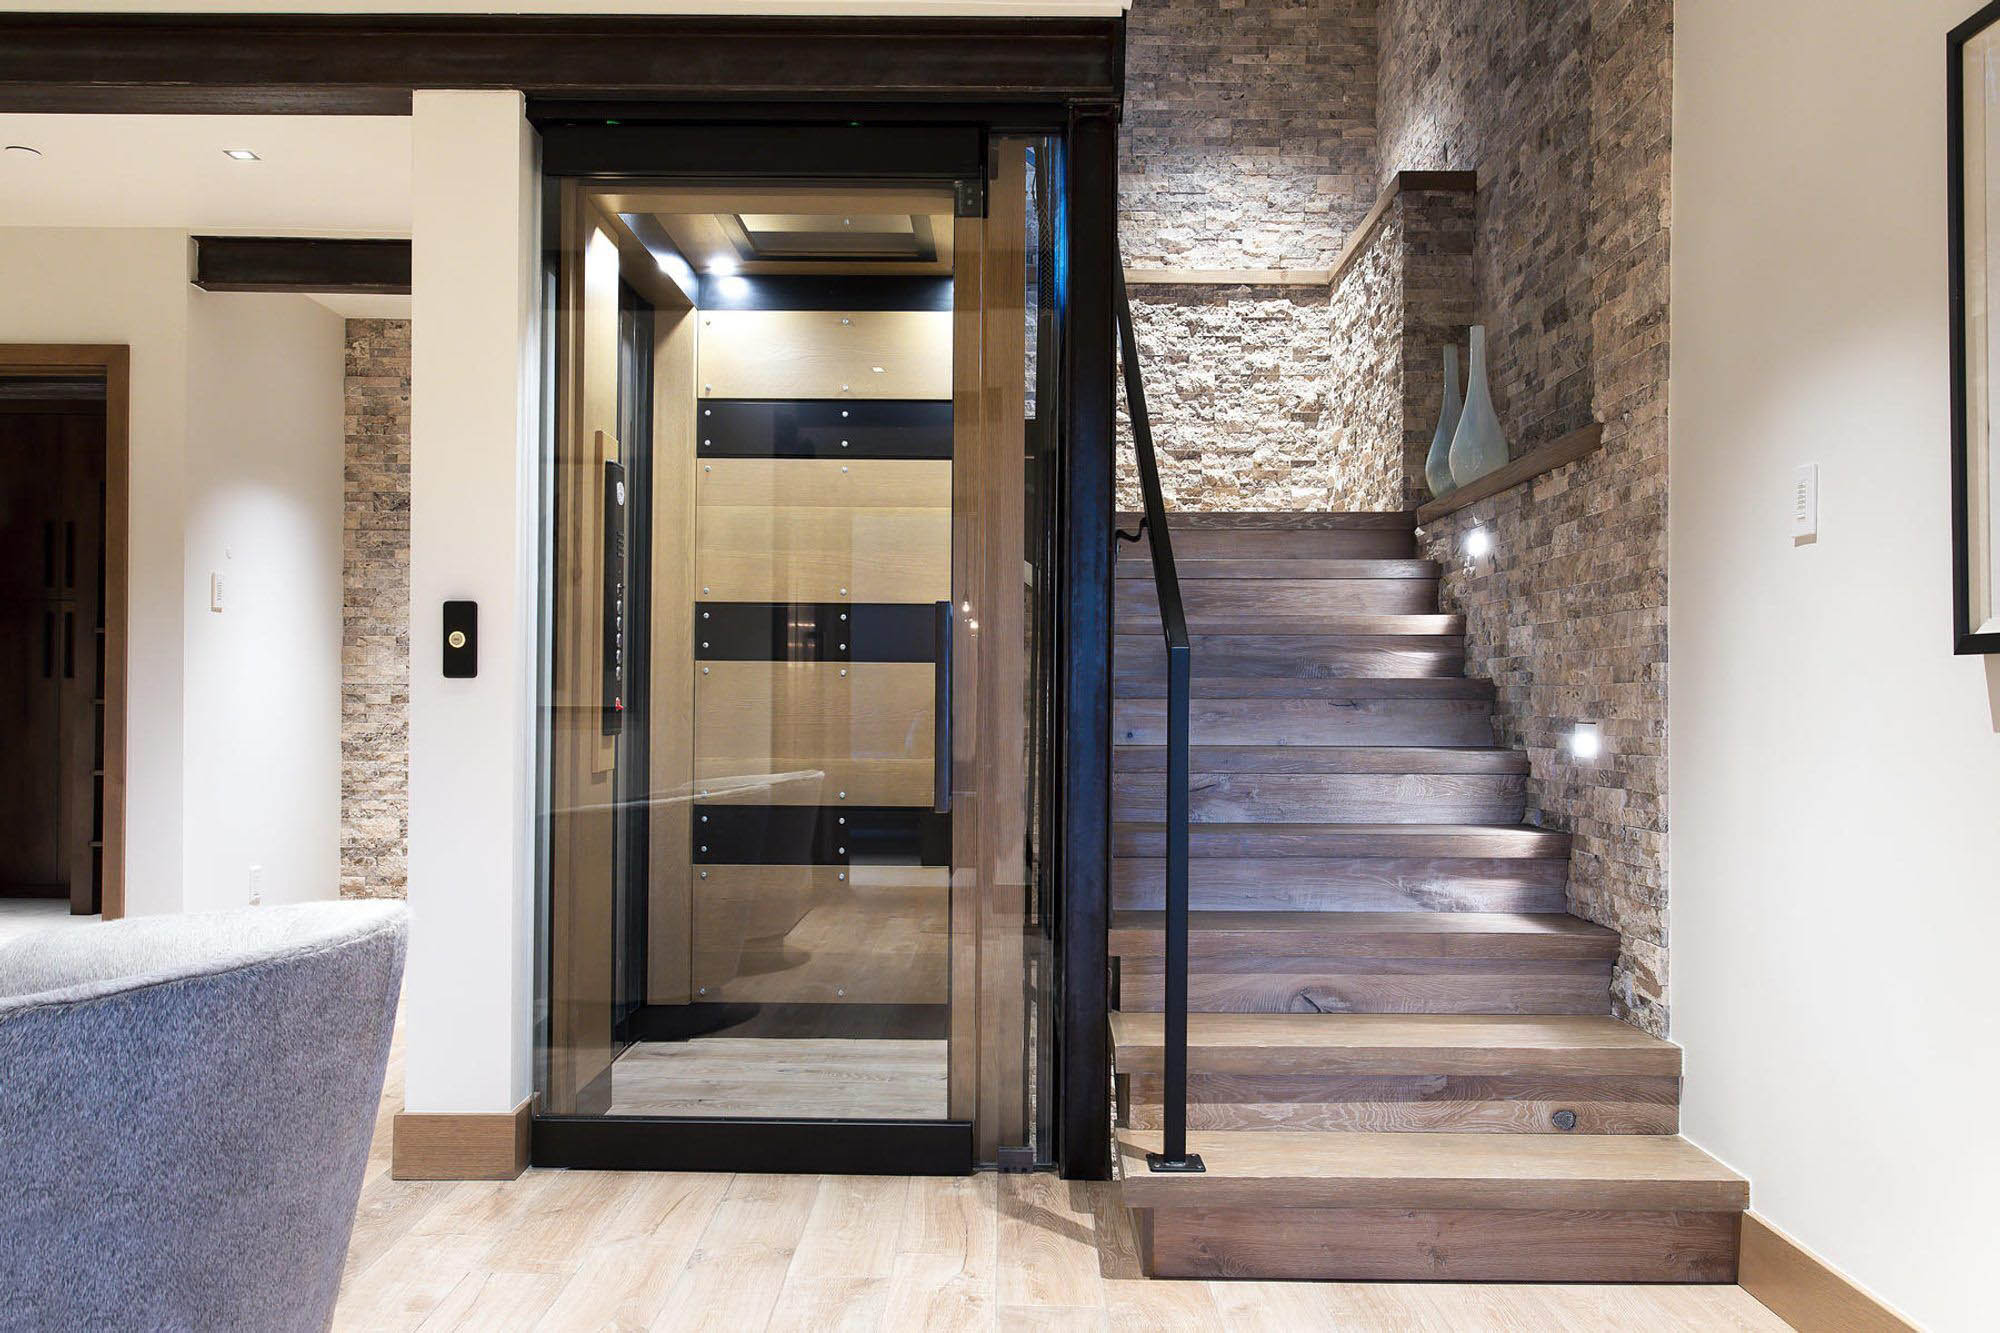 Beautiful modern staircase design with light gray wood and matching stone wall veneer. Black metal railings. Matching hardwood floors.